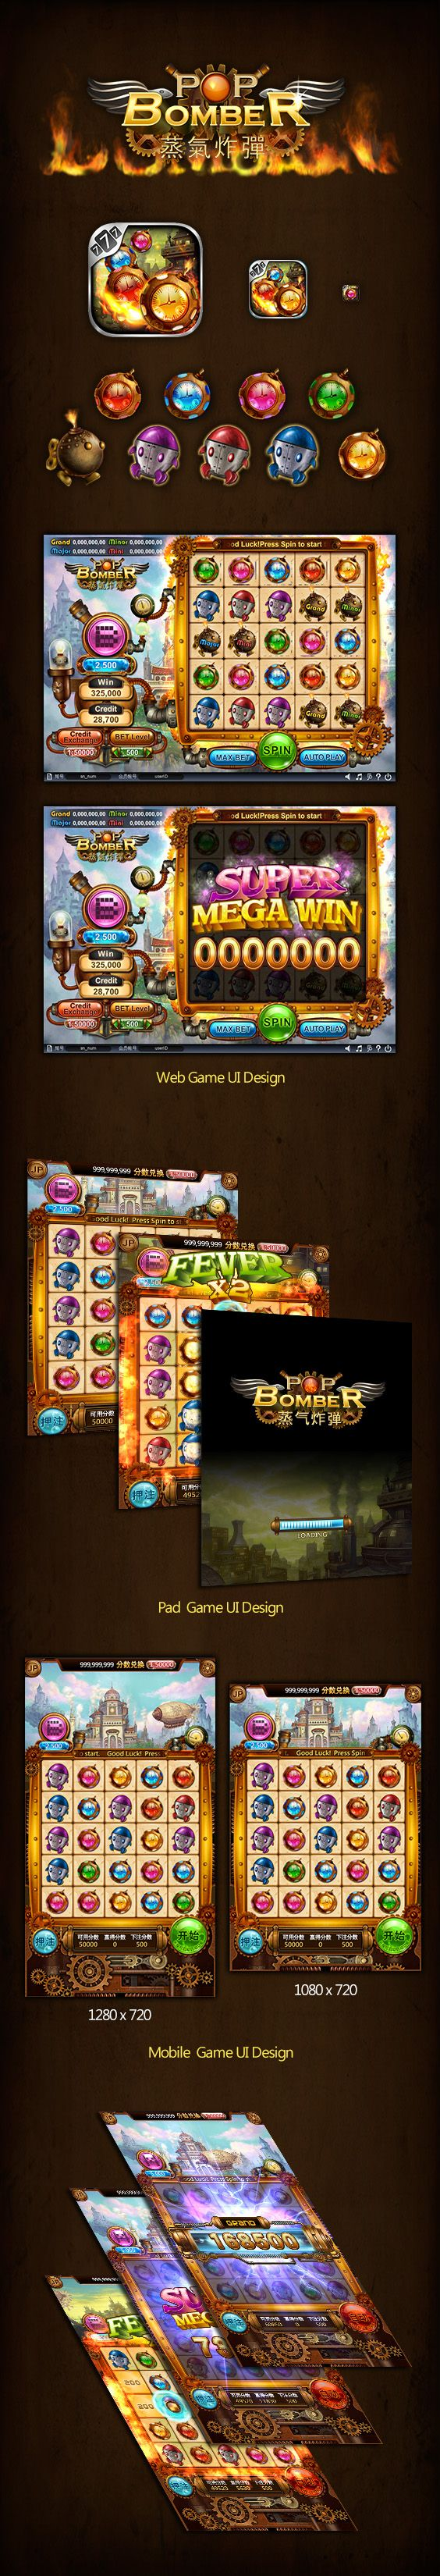 Game ui / Steampunk / Bomber Design #Web #App